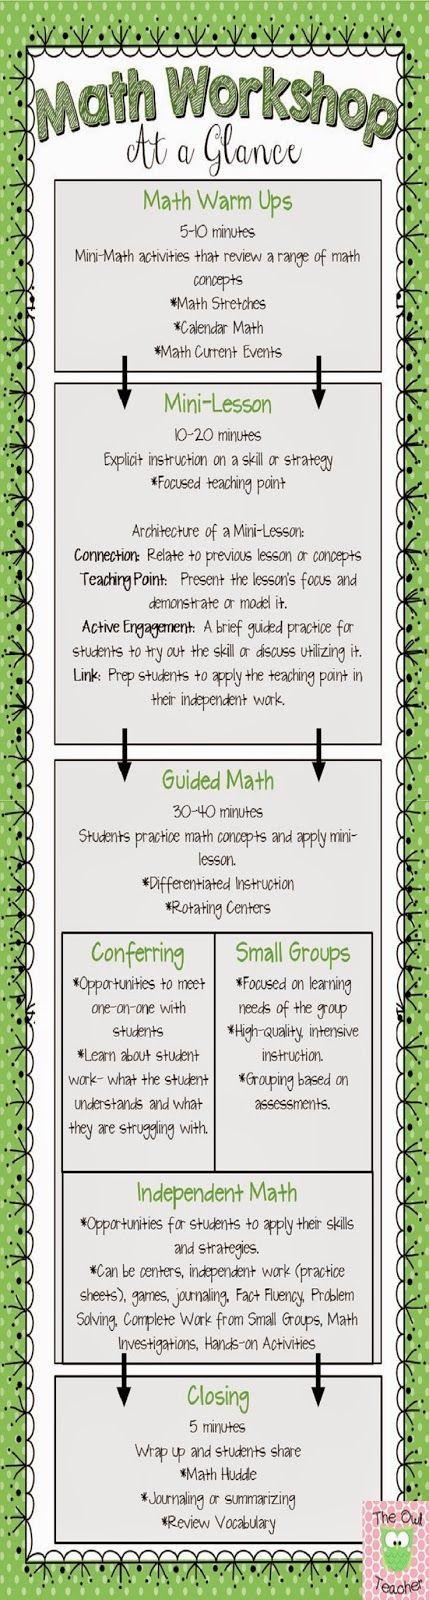 Math Workshop Lesson Plan Template 60 Math Workshop Guided Math Ideas